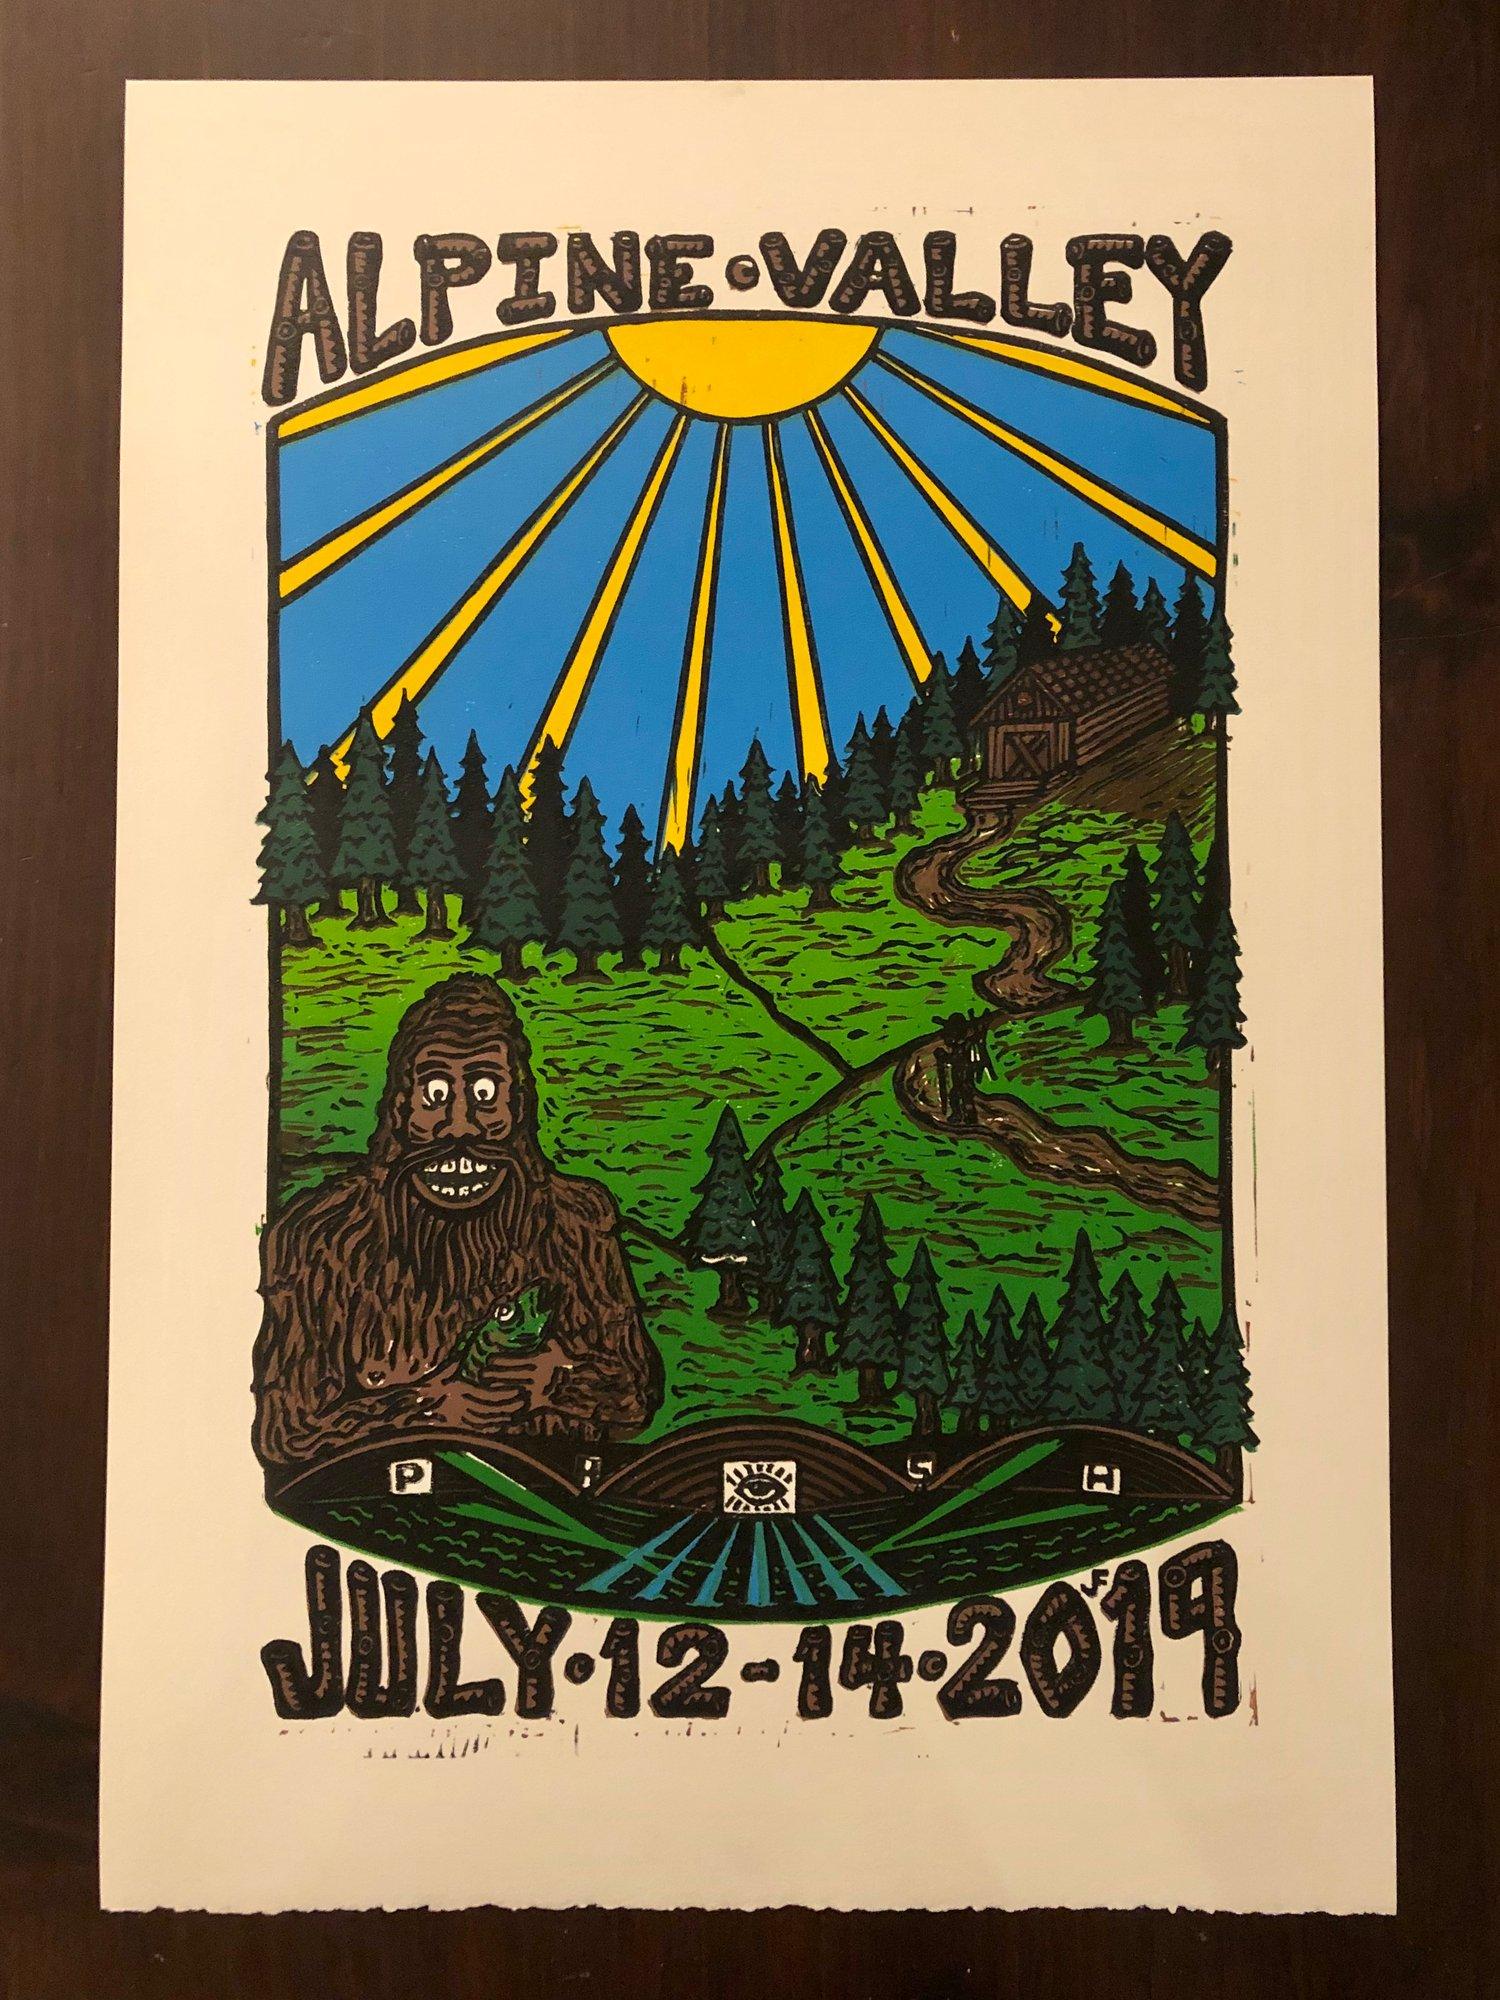 Image of Alpine Valley prints